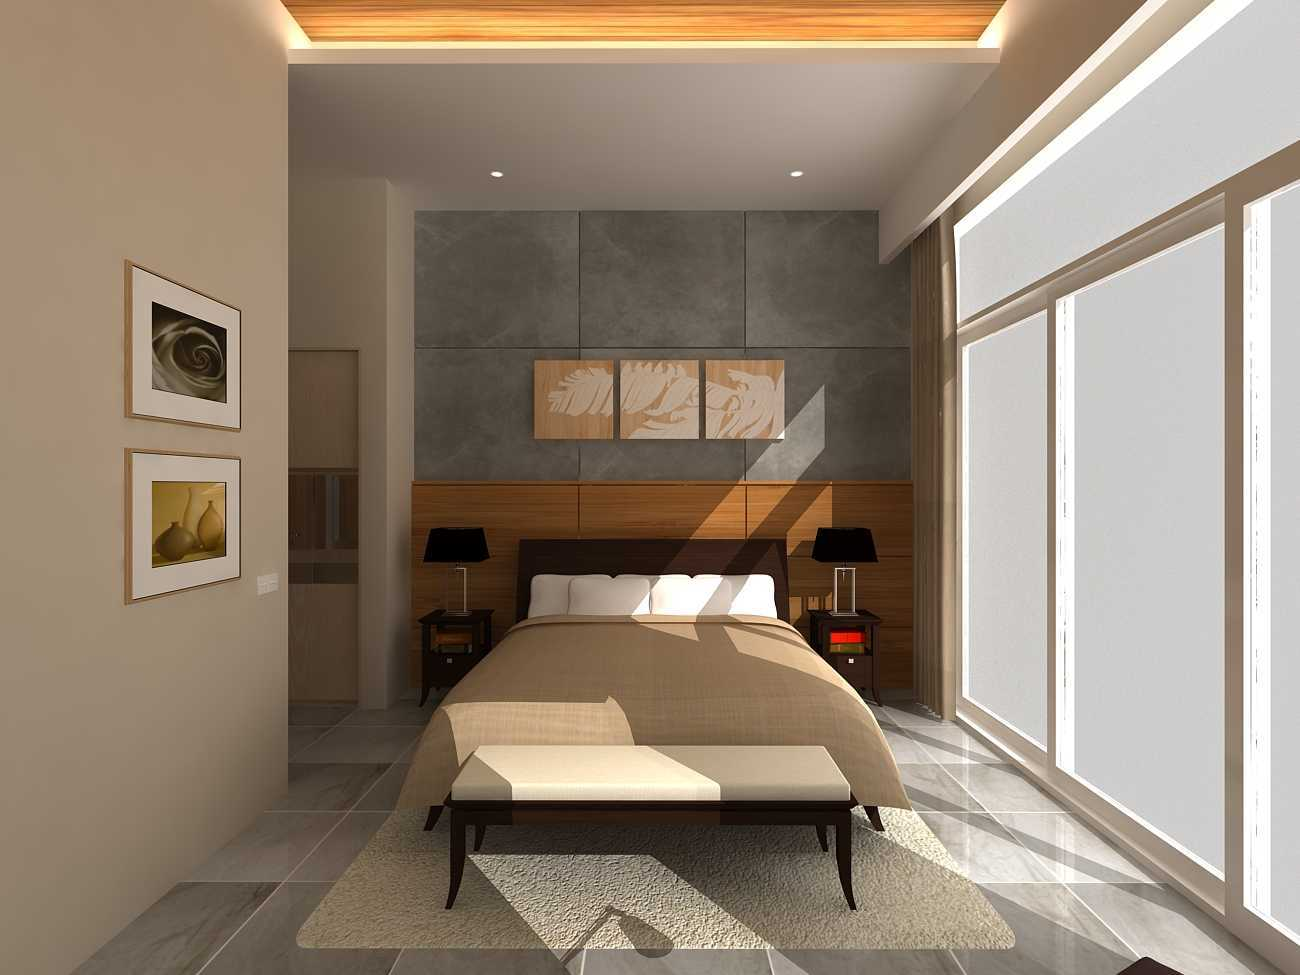 Emil Yusman (E'architect) Sunter Paradise  Jl. Paradise 8, Sunter Agung, Tj. Priok, Kota Jkt Utara, Daerah Khusus Ibukota Jakarta 14350, Indonesia North Jakarta Master-Bedroom  20188